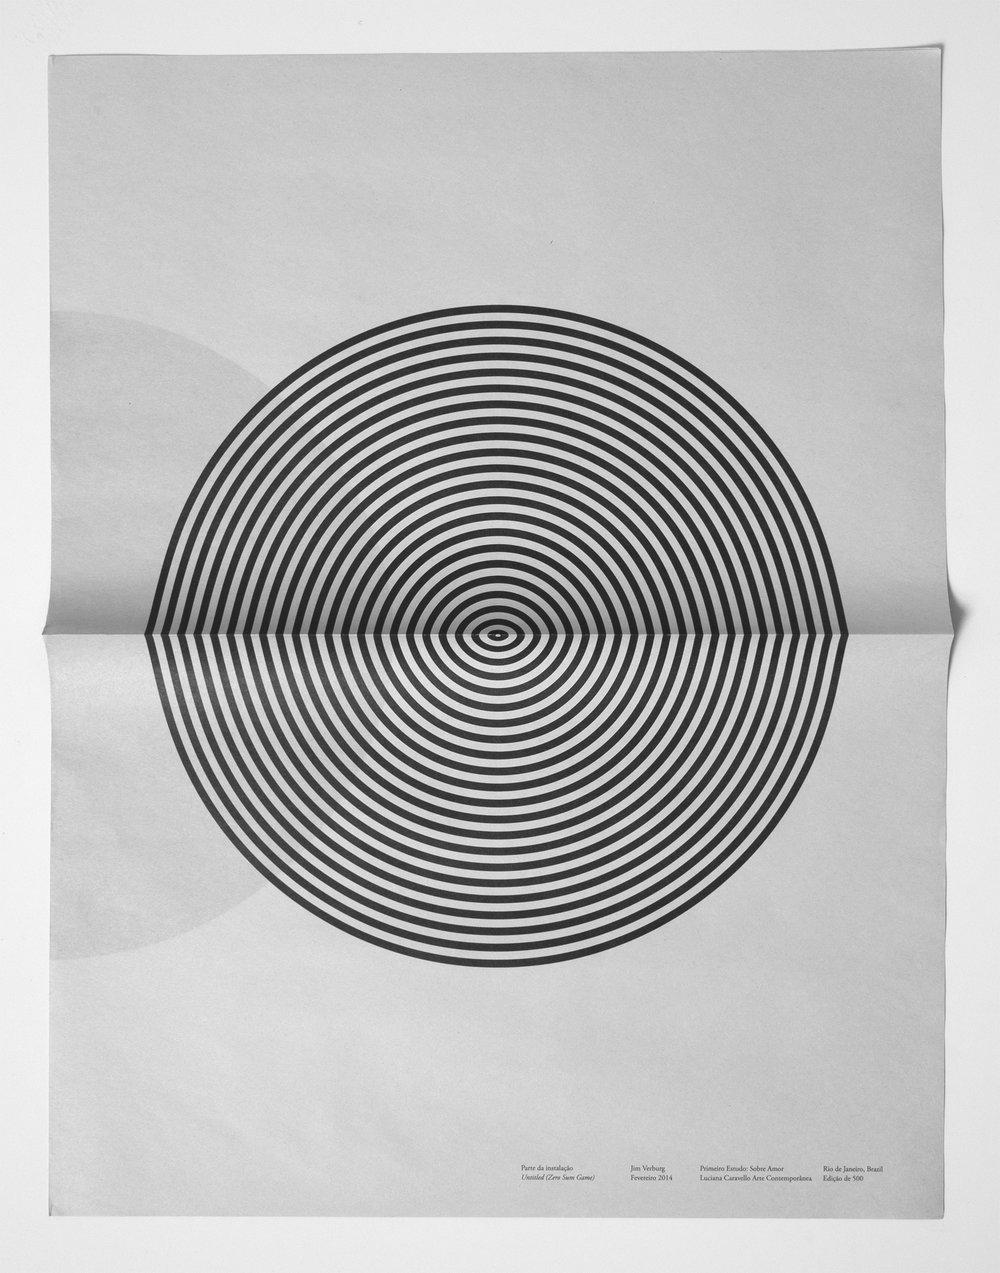 "Jim Verburg,  Untitled (Zero Sum Game),  2011, folded newsprint publication in stacks, various dimensions each piece, 35"" x 22"" (89 x 56 cm)"